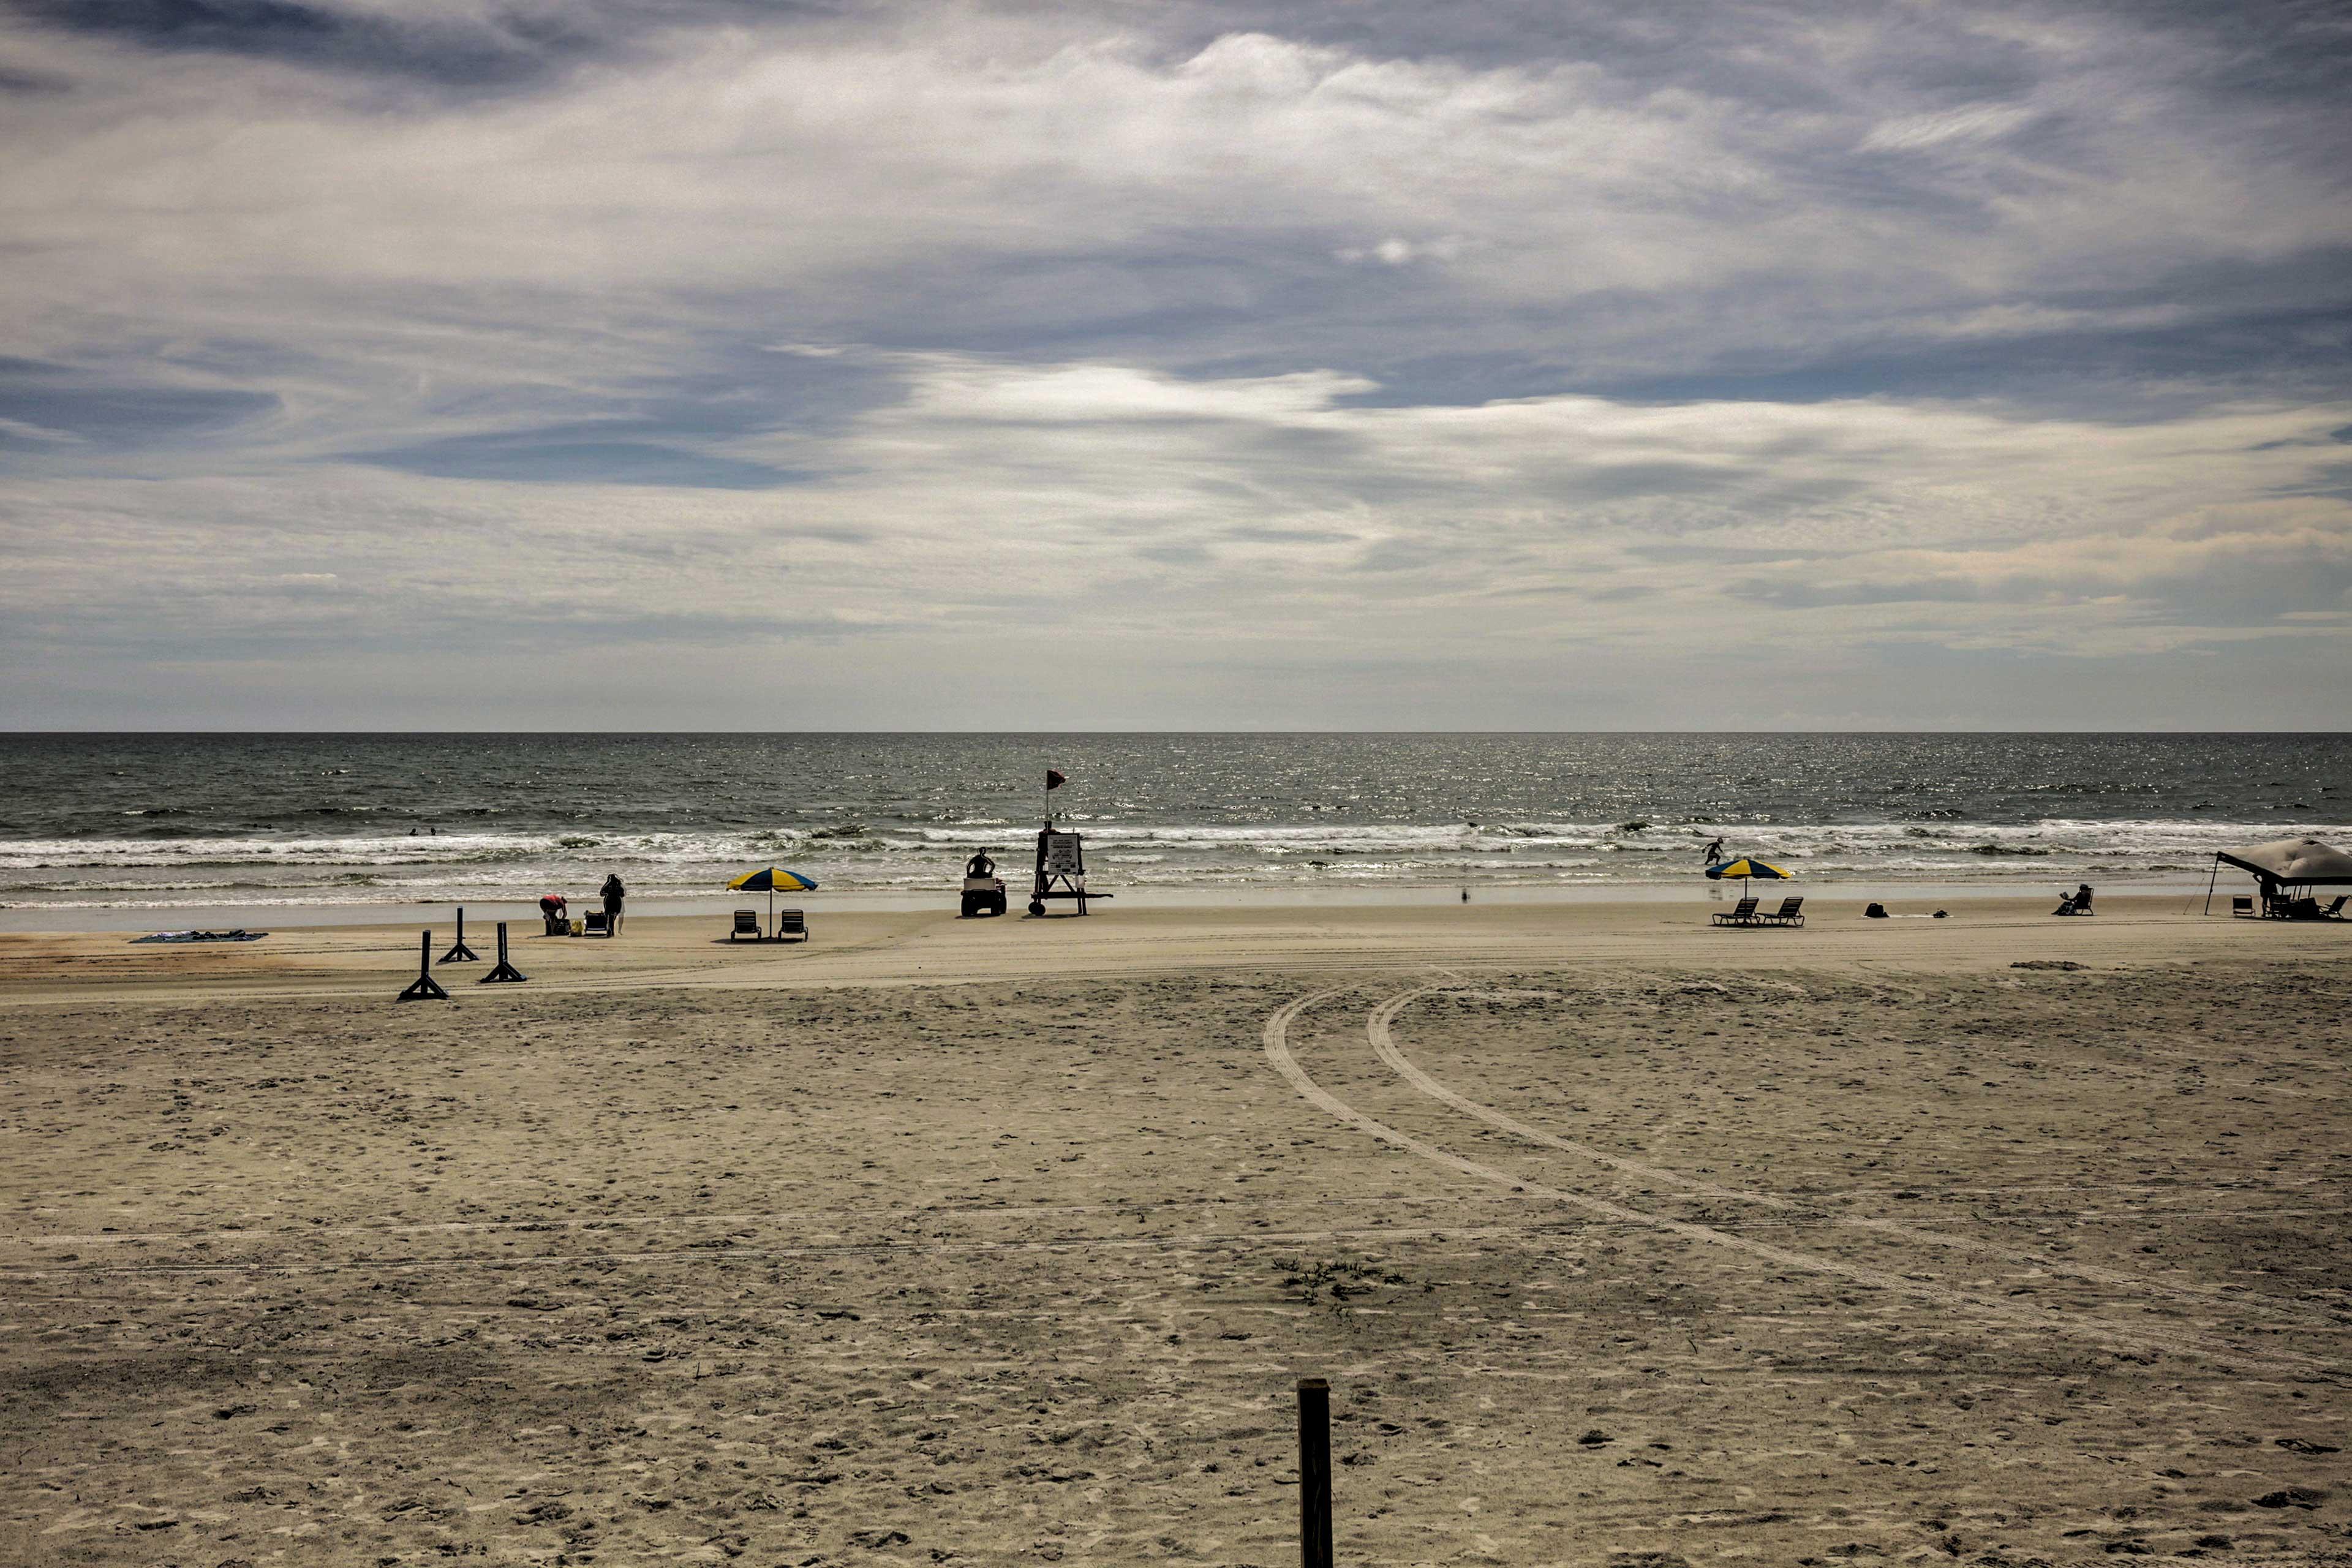 Make your next getaway a great one at this Daytona Beach retreat!